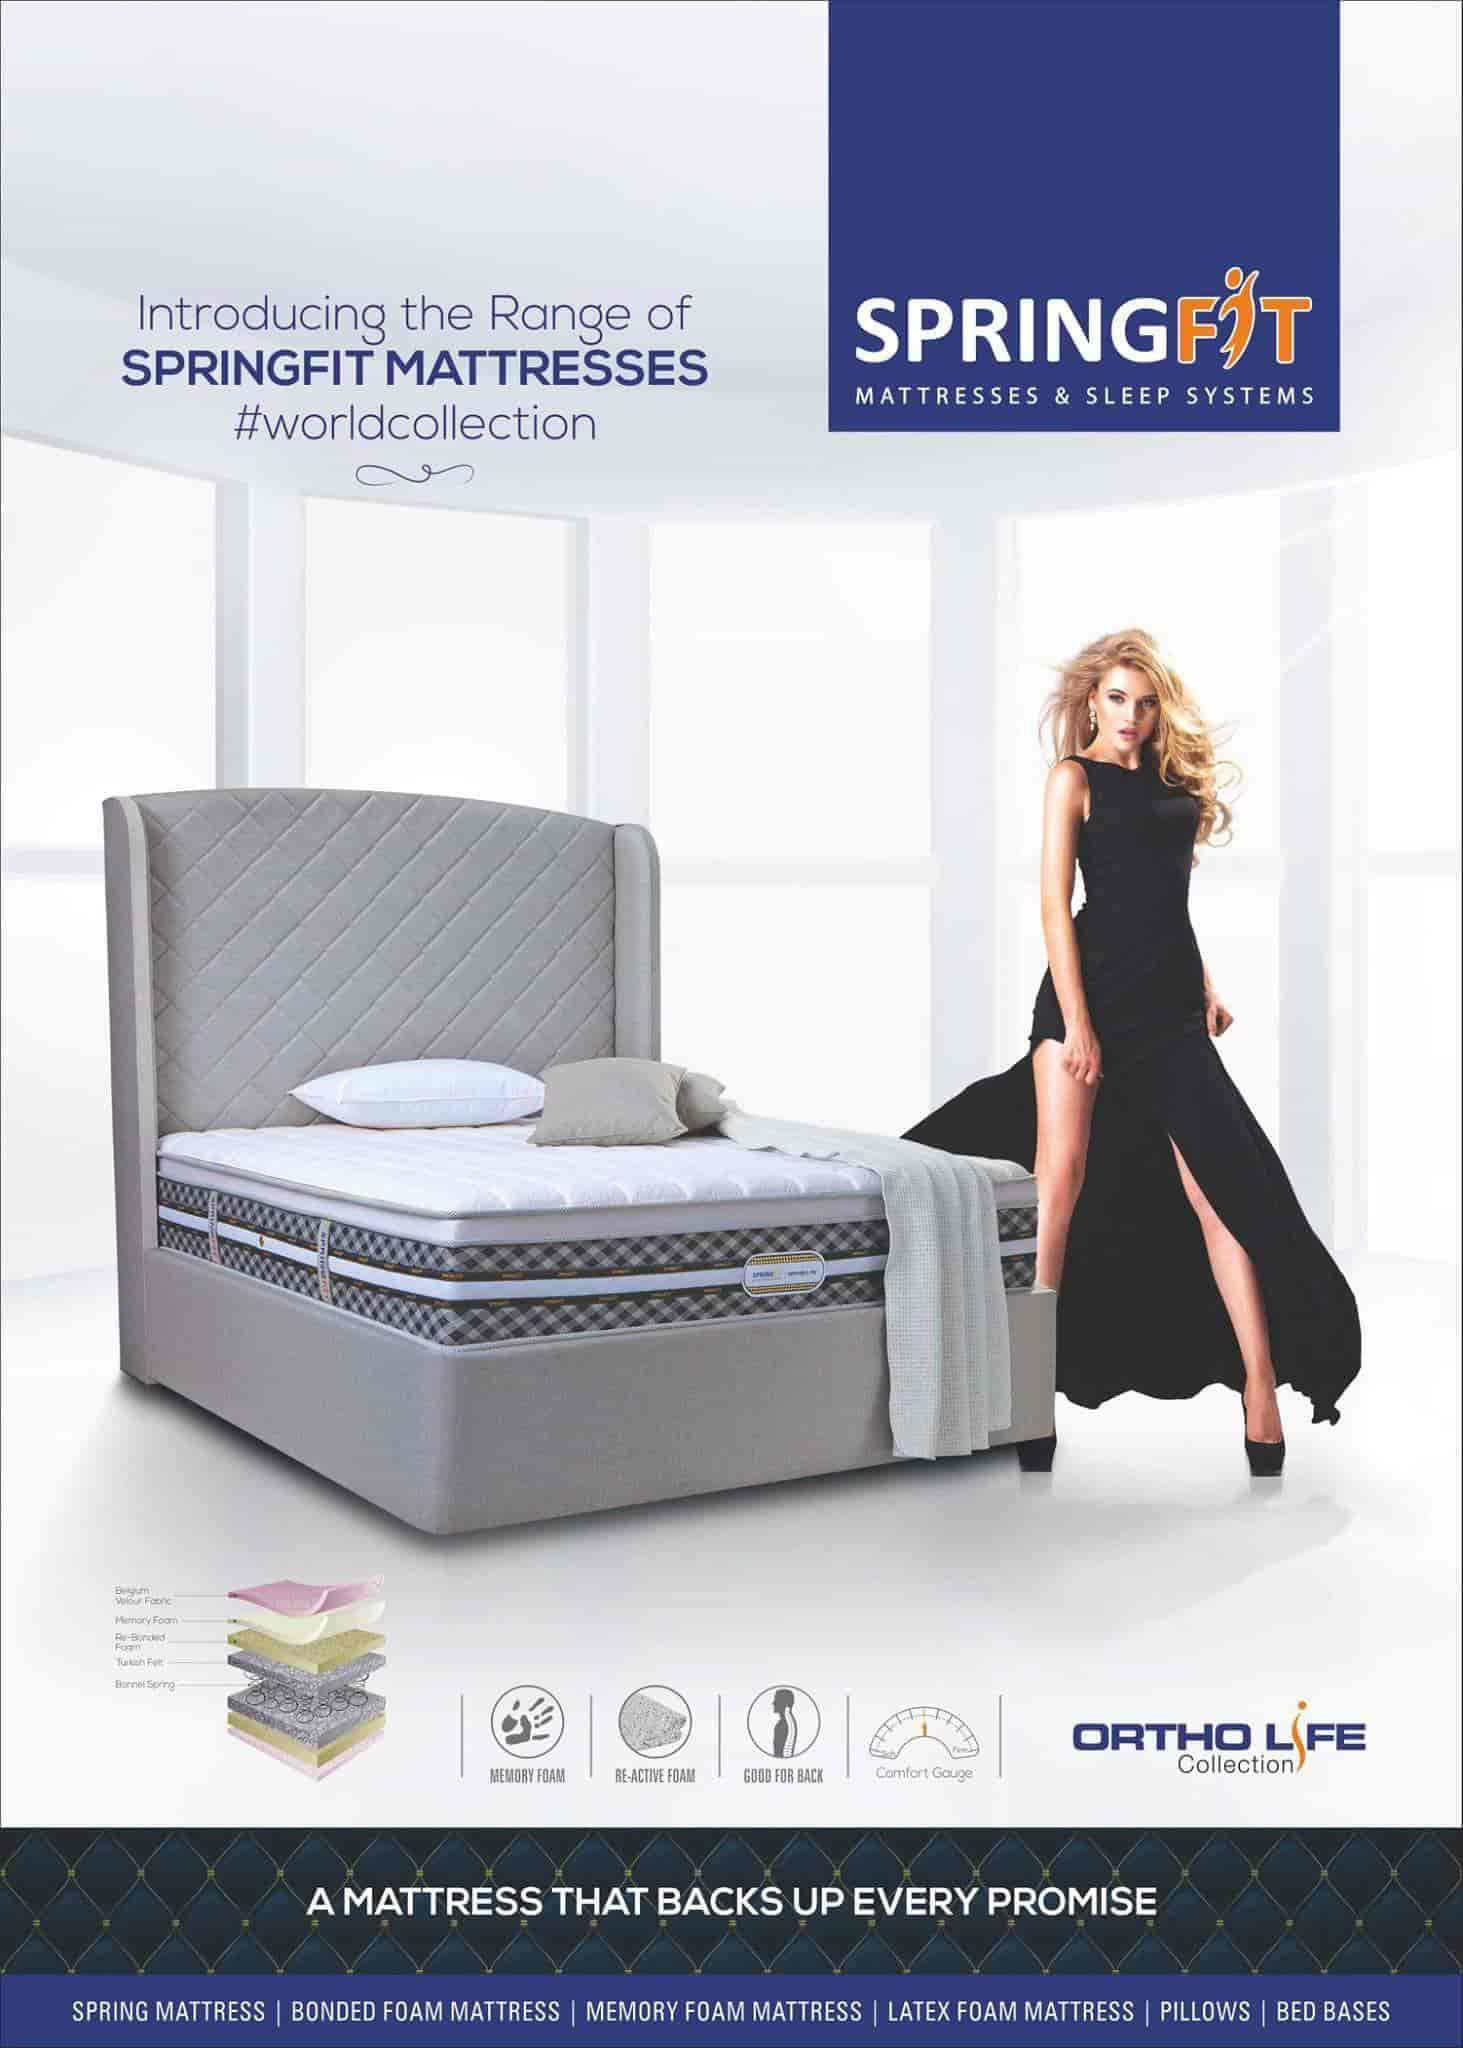 springfit mattresses and sleep system photos undri pune pictures